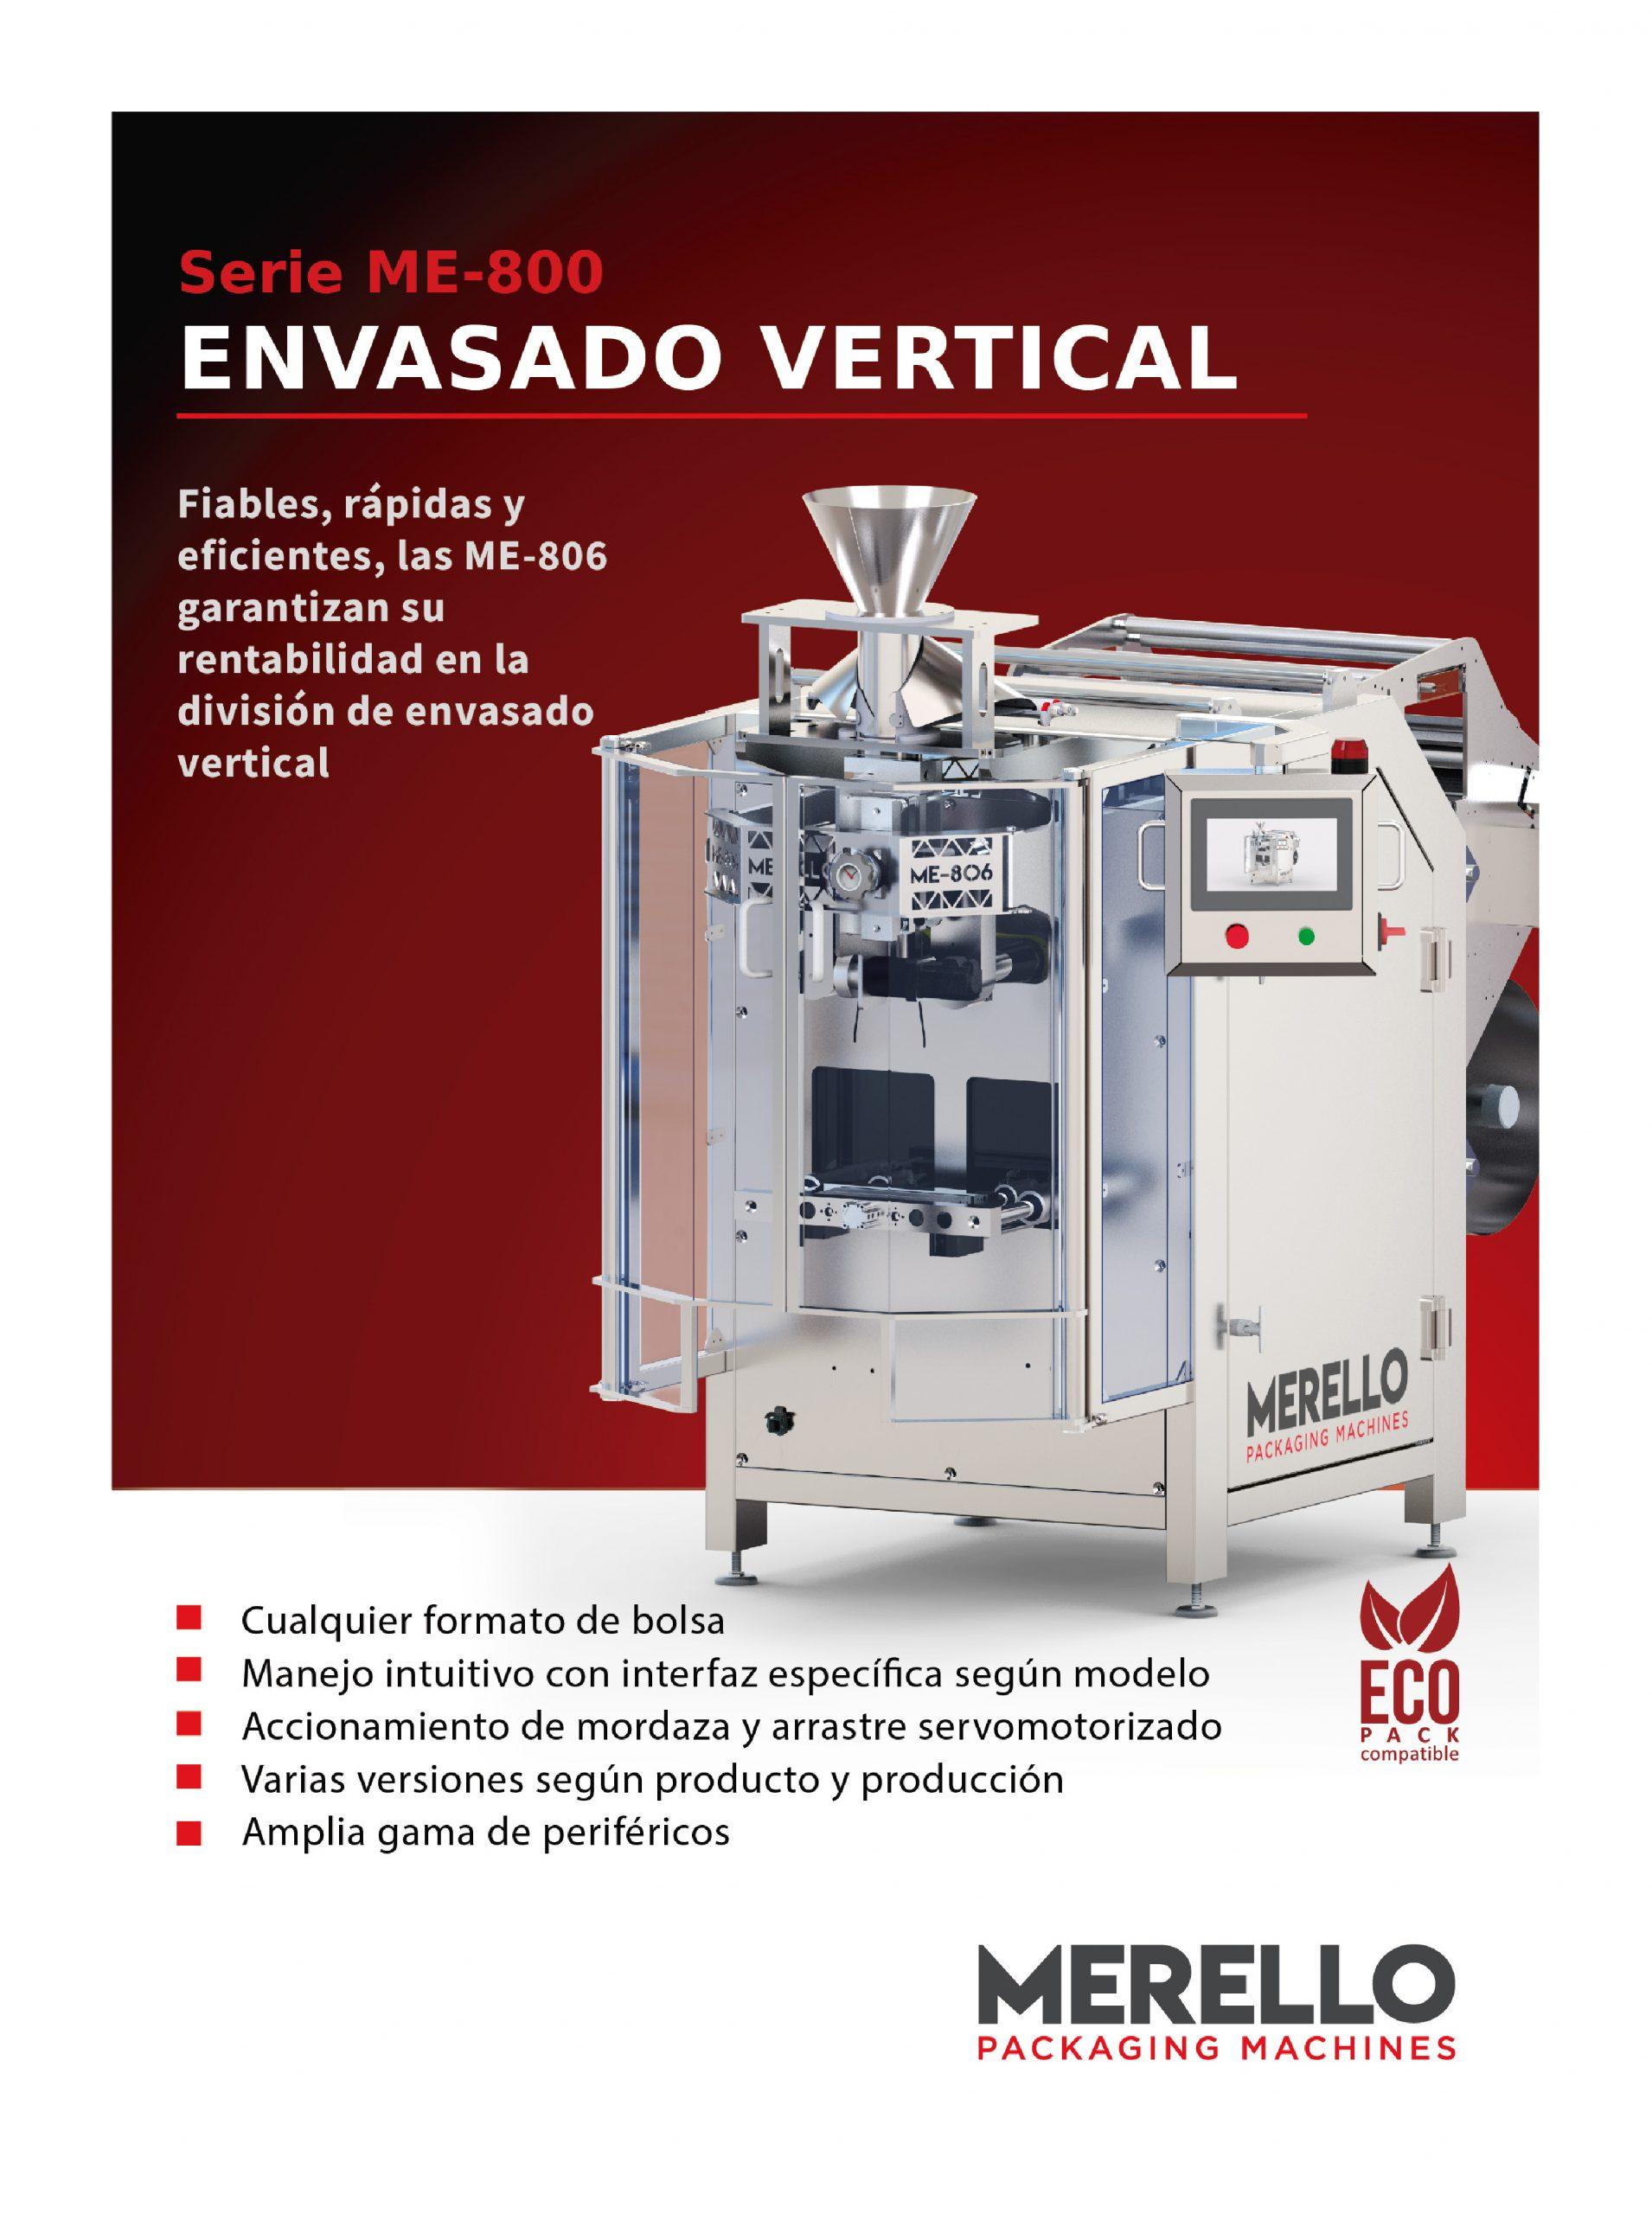 catalogo-fabricantes-maquinaria-envasado-vertical-industrial-portada